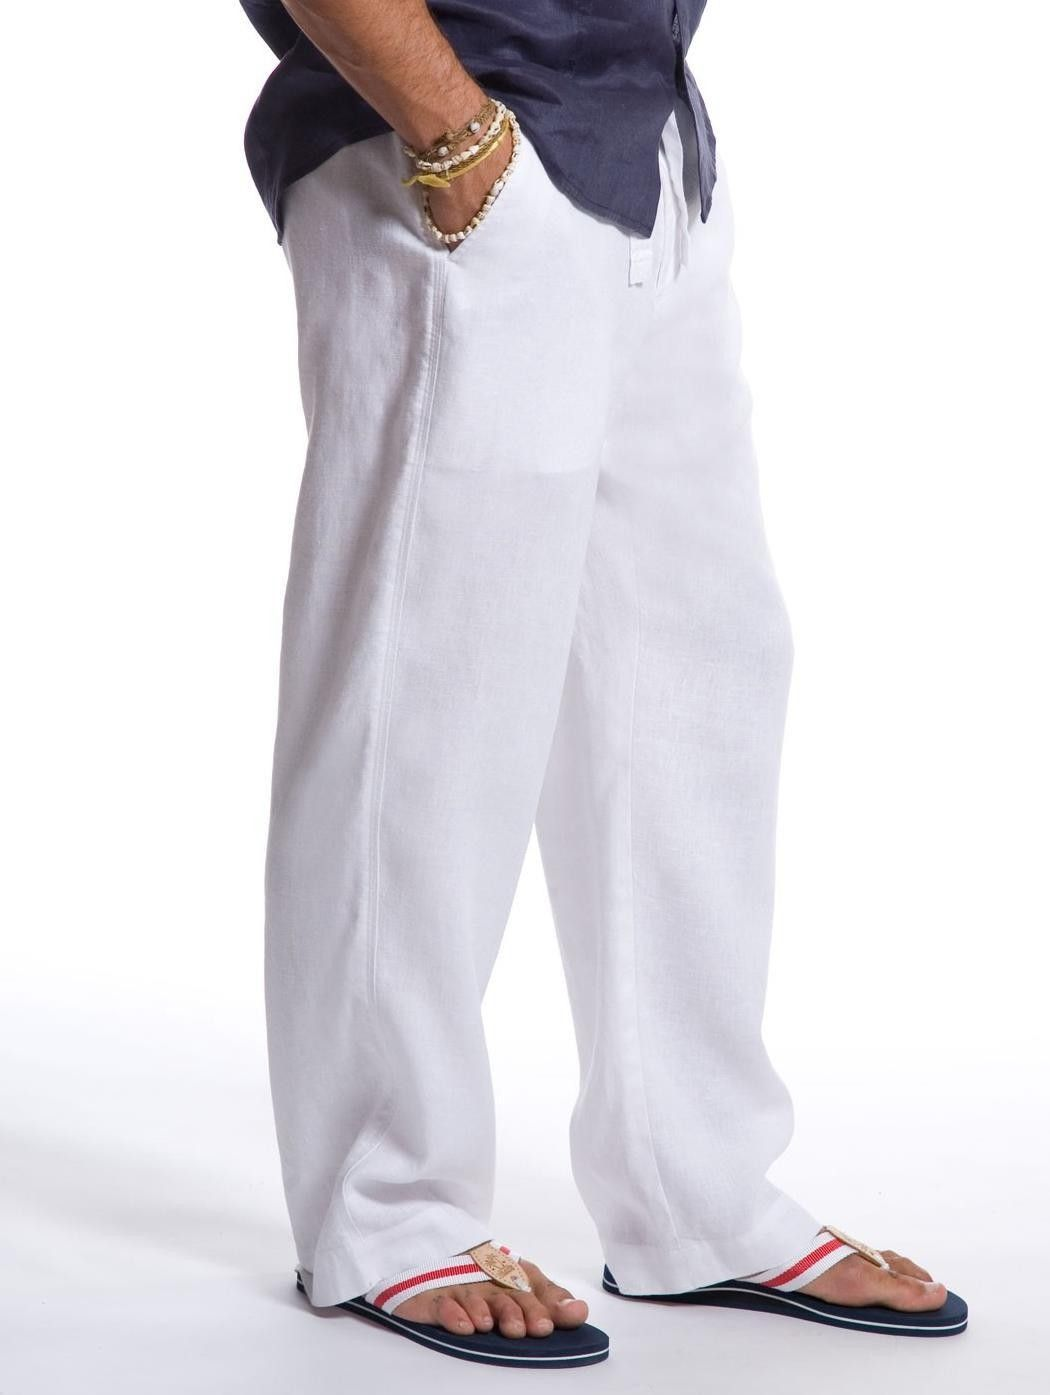 5a5491e2e865 Beachcomber Linen Pants - White Linen Pants for Men